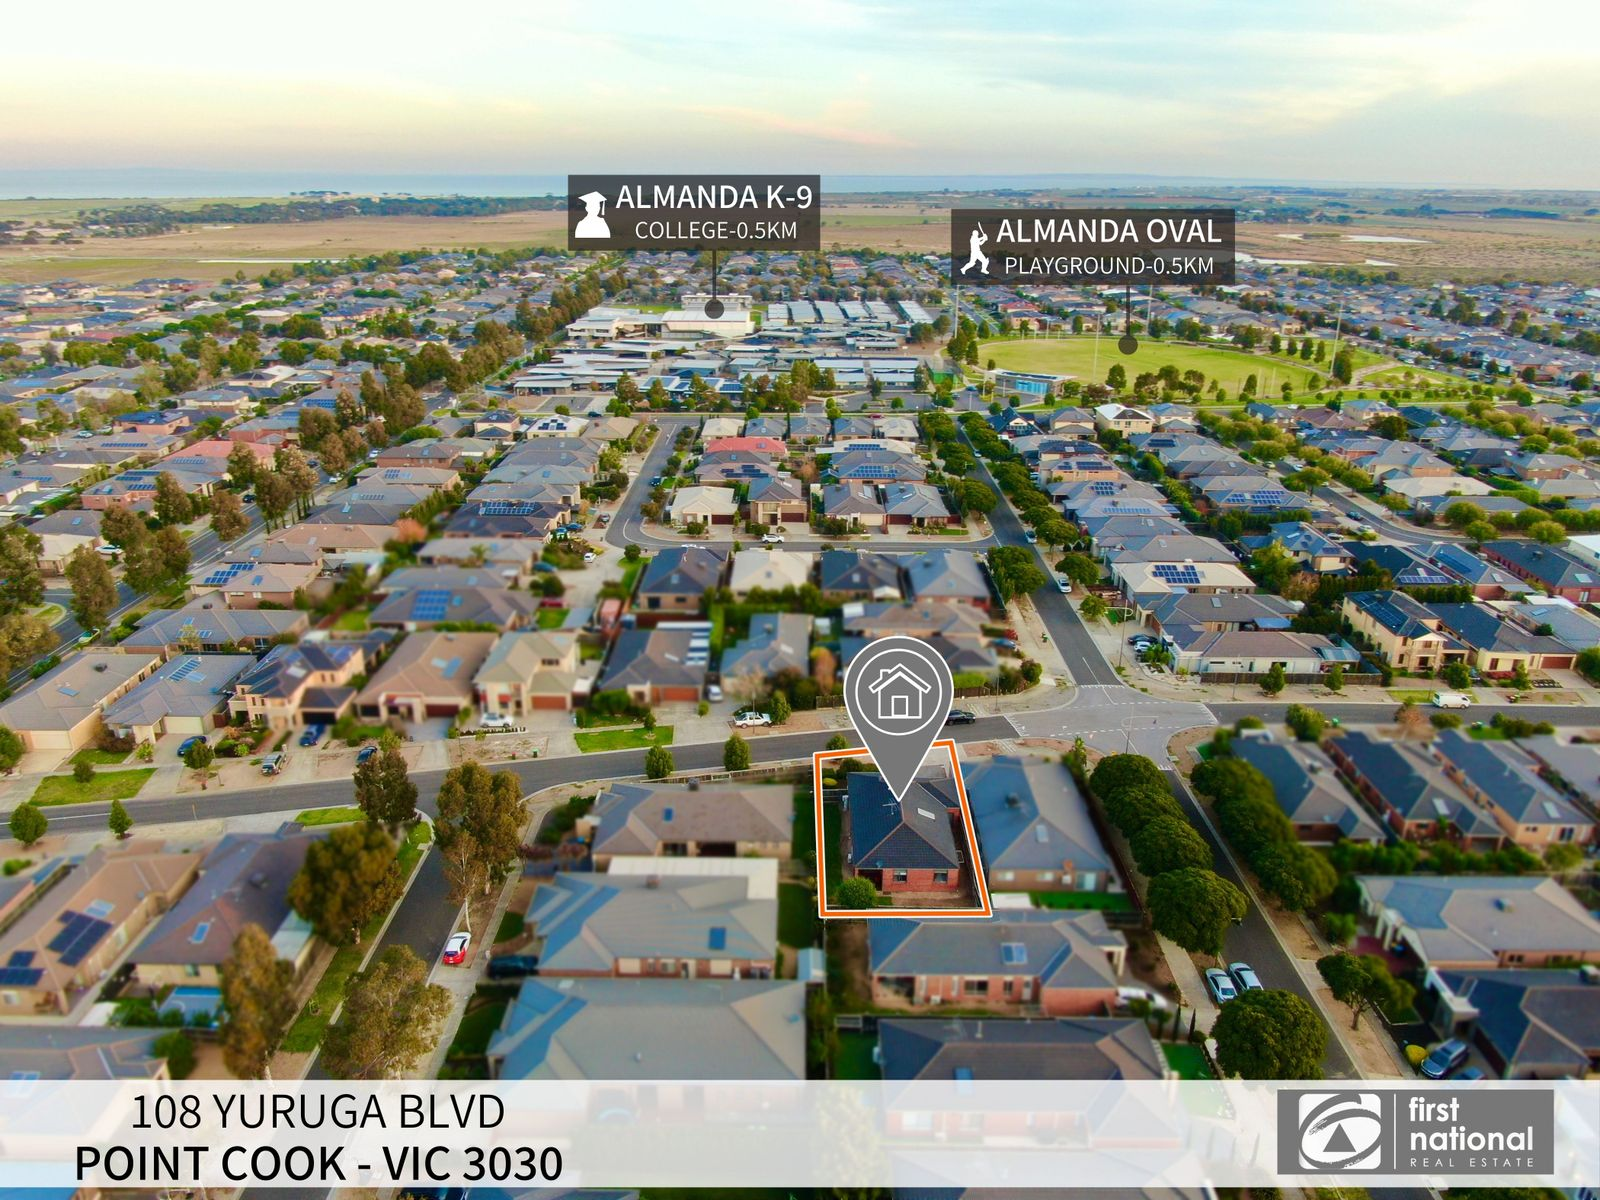 108 Yuruga Boulevard, Point Cook, VIC 3030